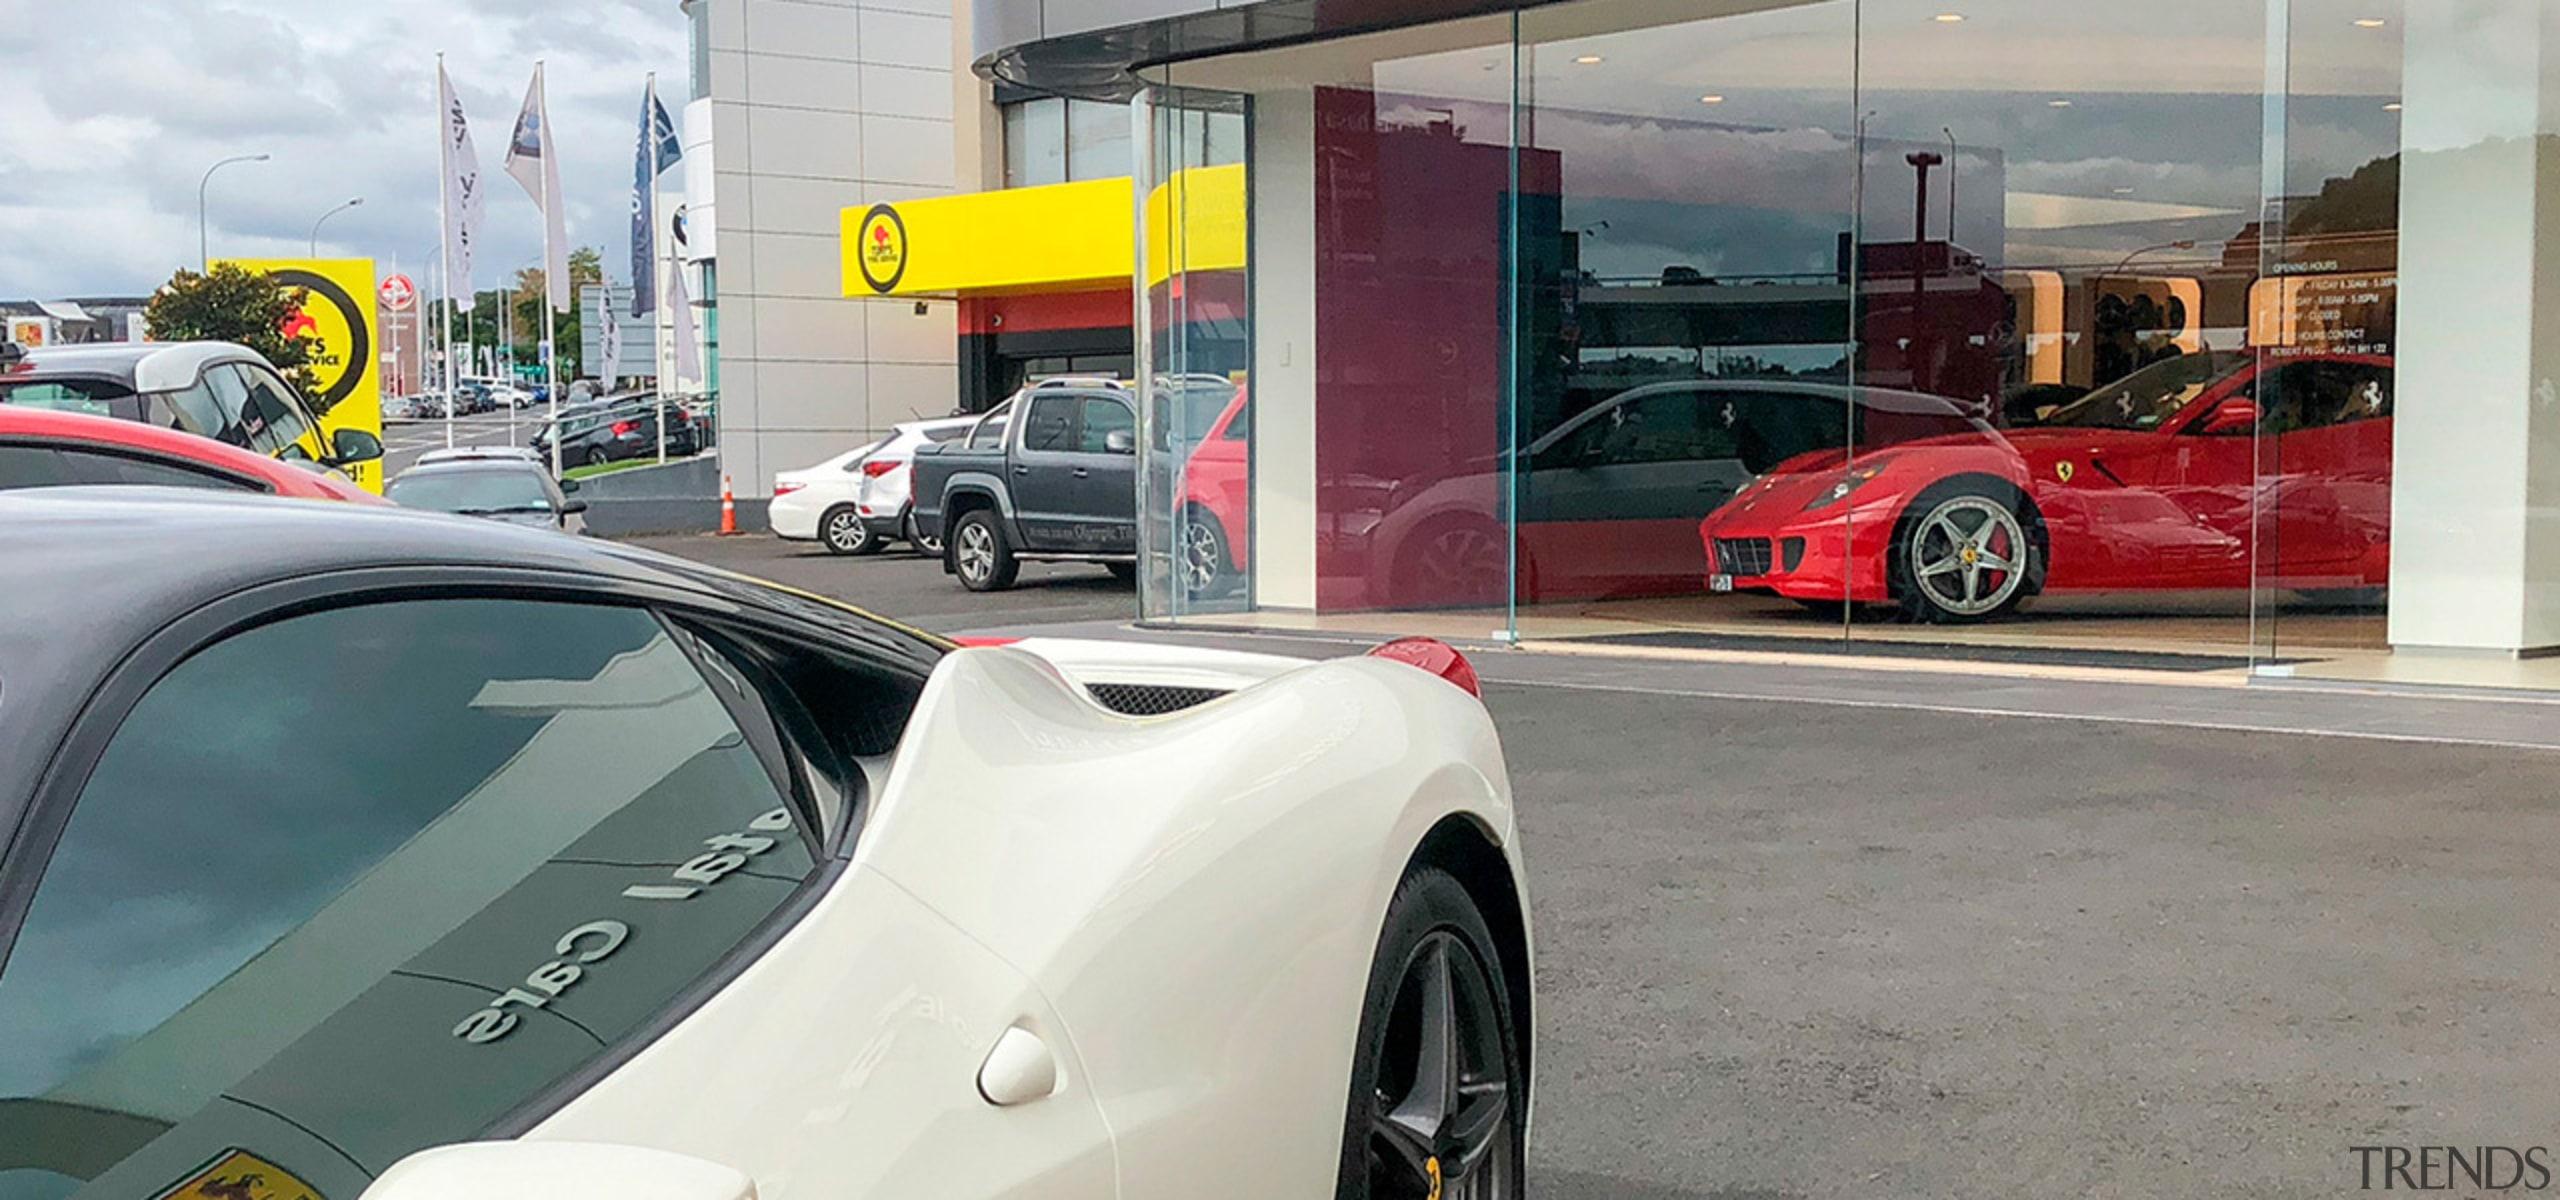 Ferrari Showroom 5 - automotive design | car automotive design, car, coupé, land vehicle, luxury vehicle, race car, sports car, supercar, vehicle, gray, white